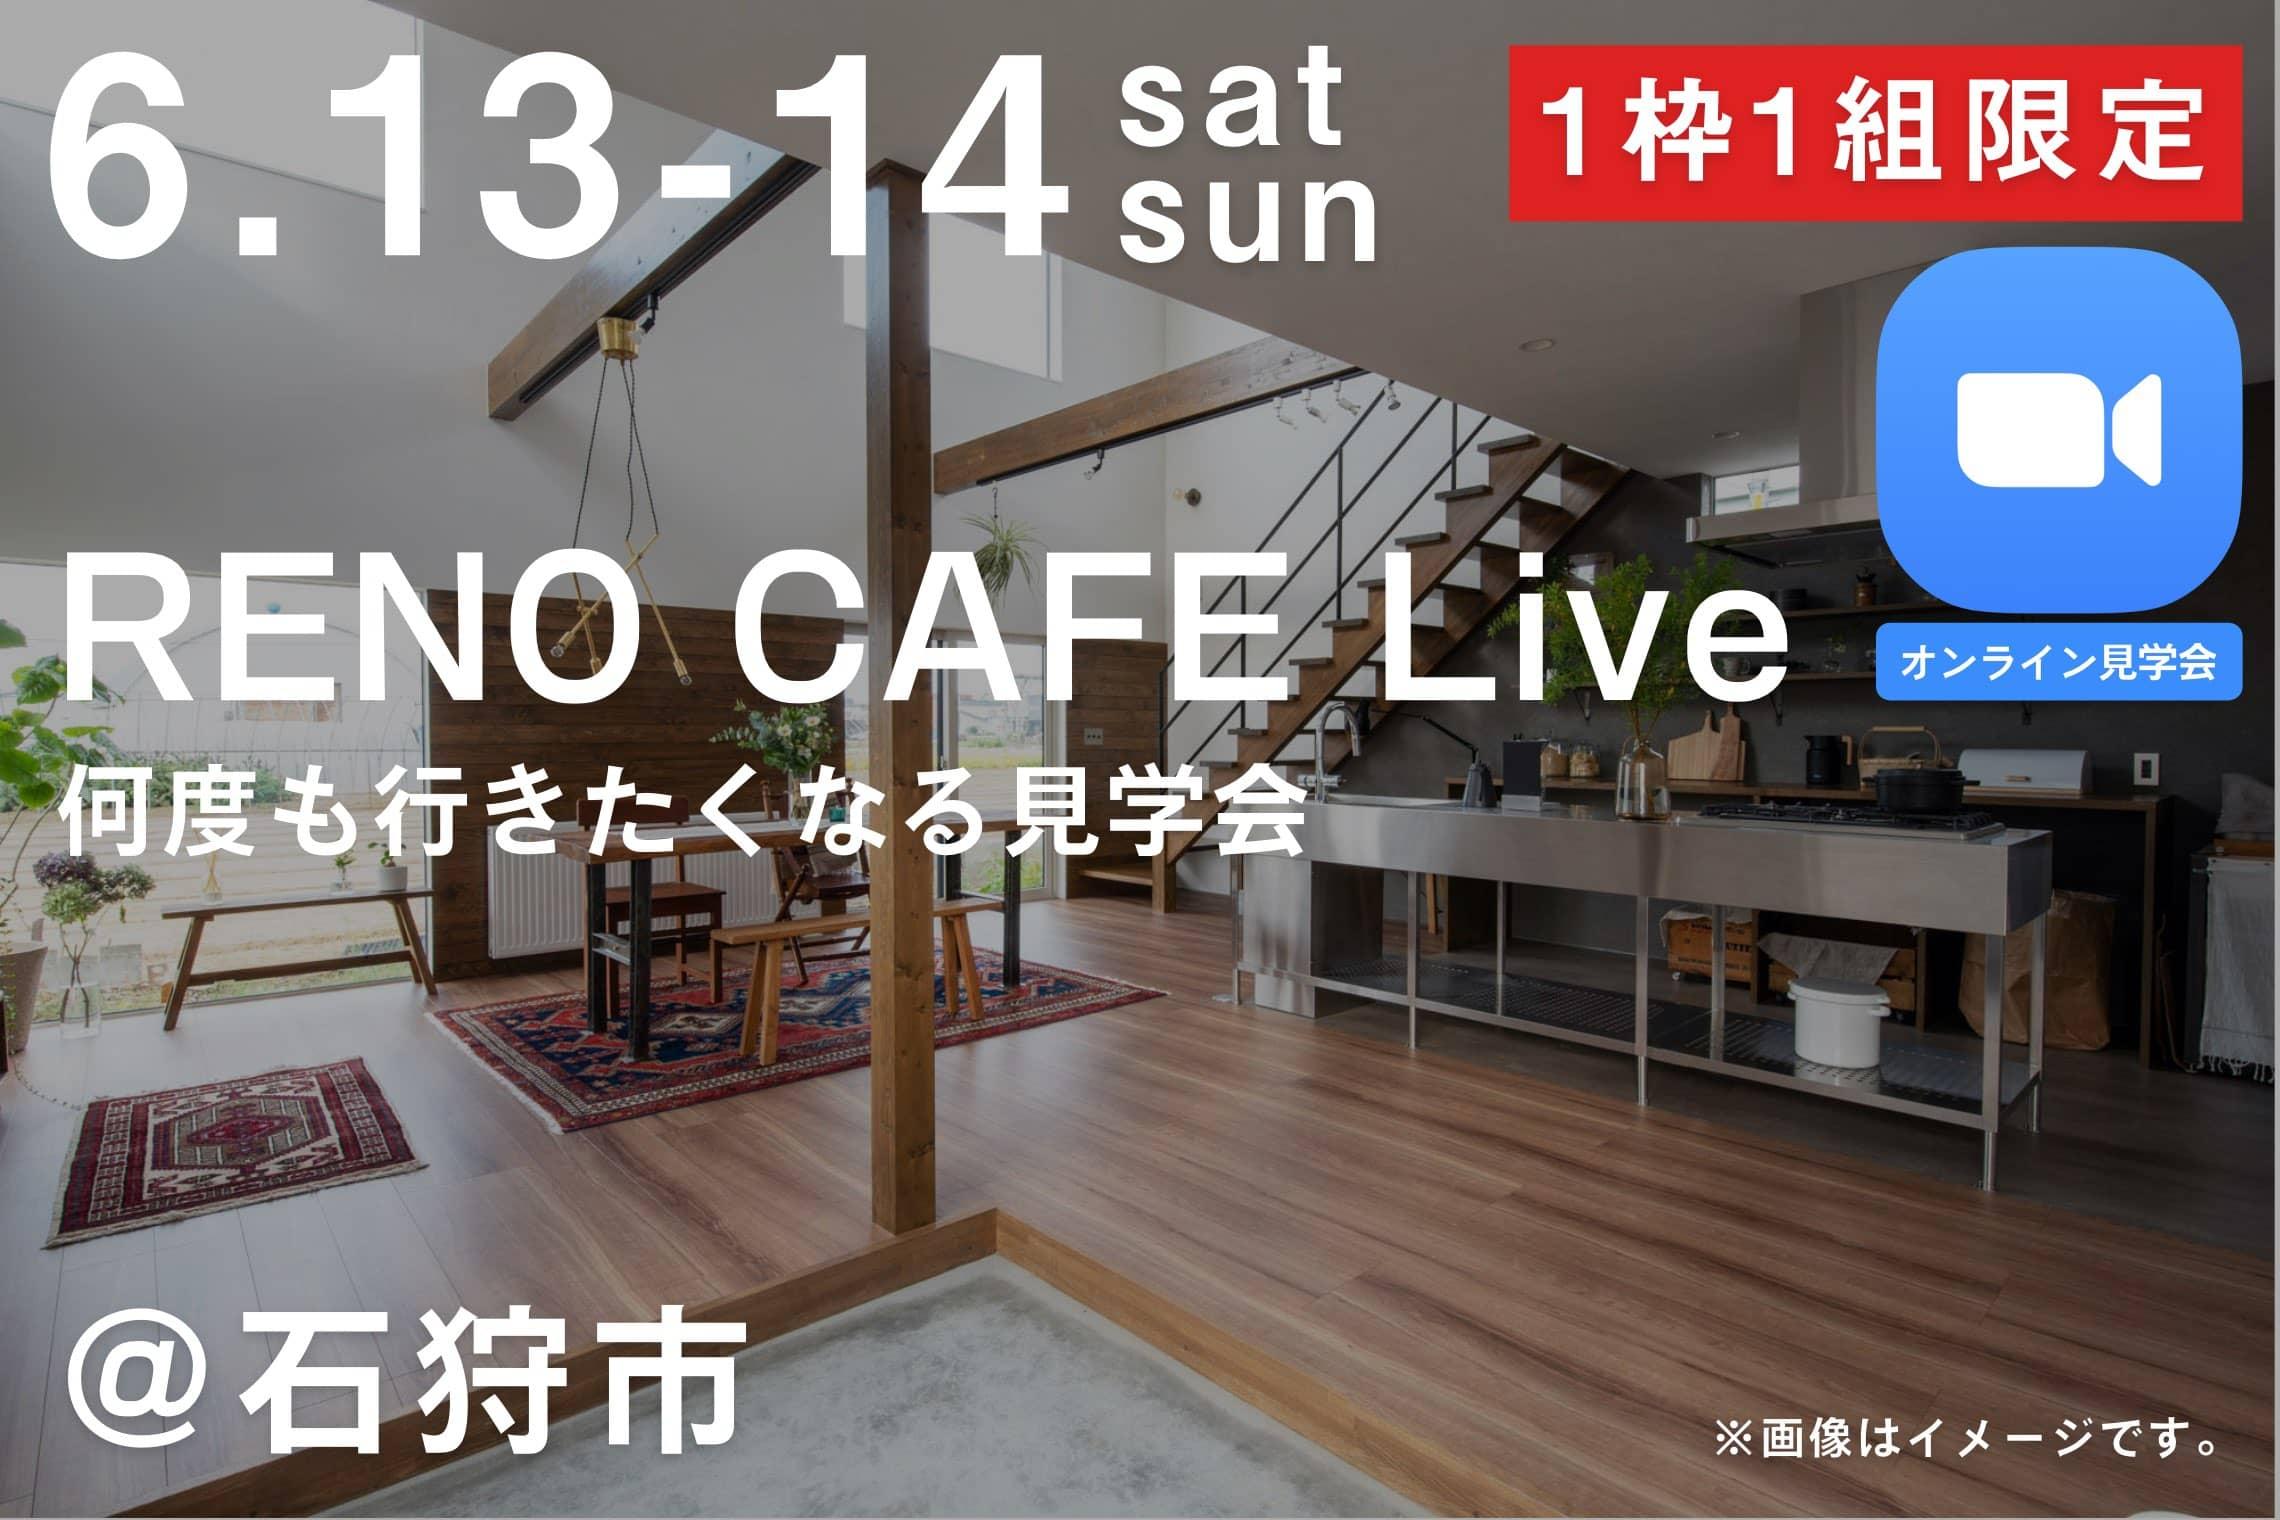 RENO CAFE Live(注文住宅の完成見学会)石狩市